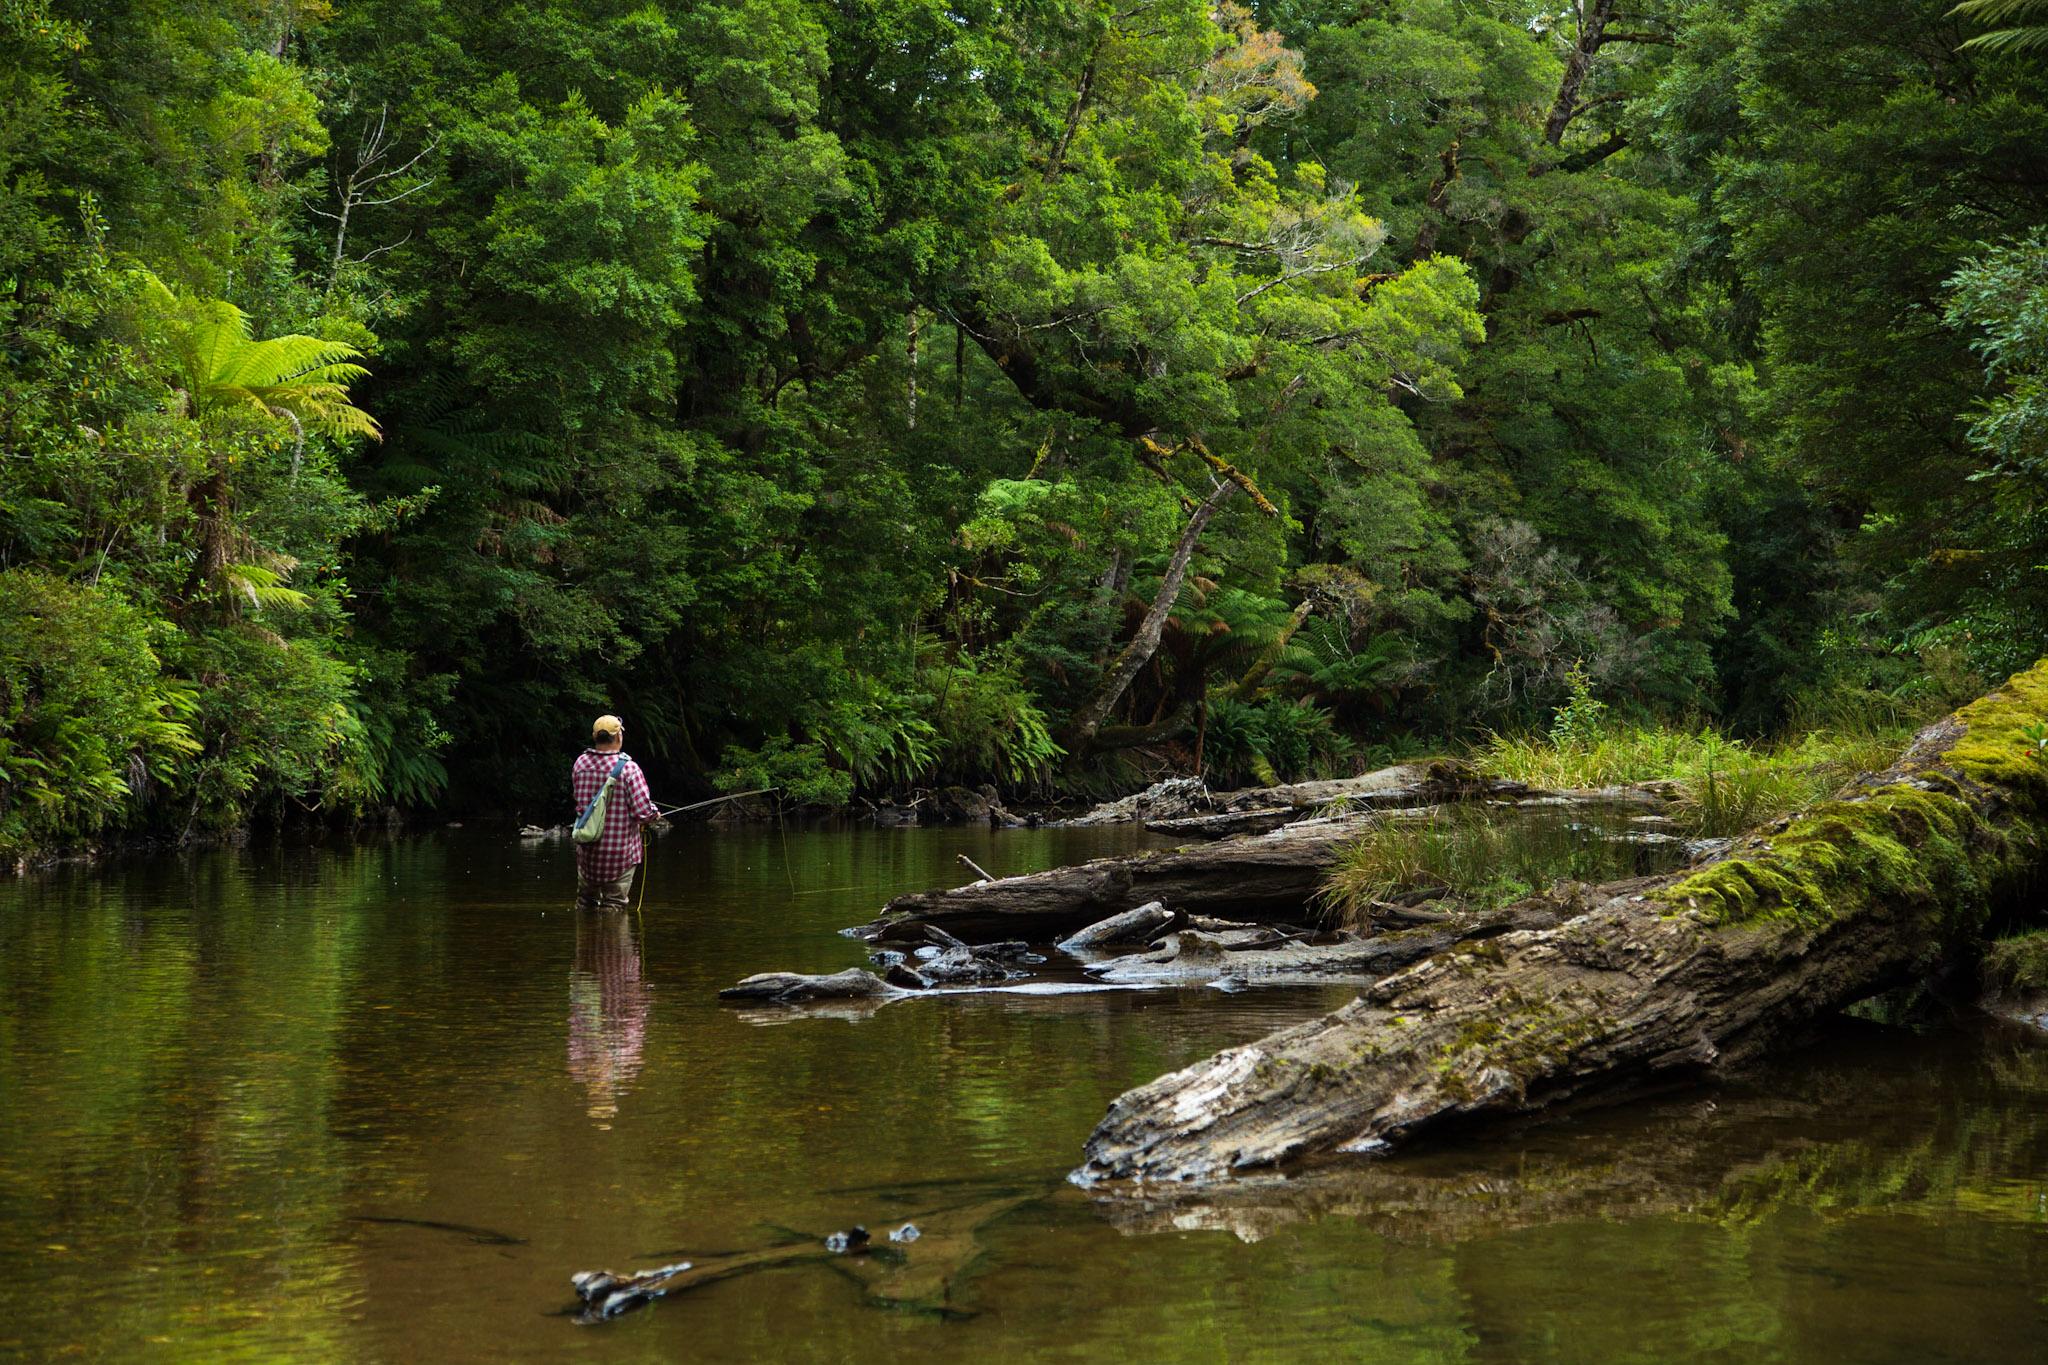 Dry fly fishing the Styx River, Tasmania